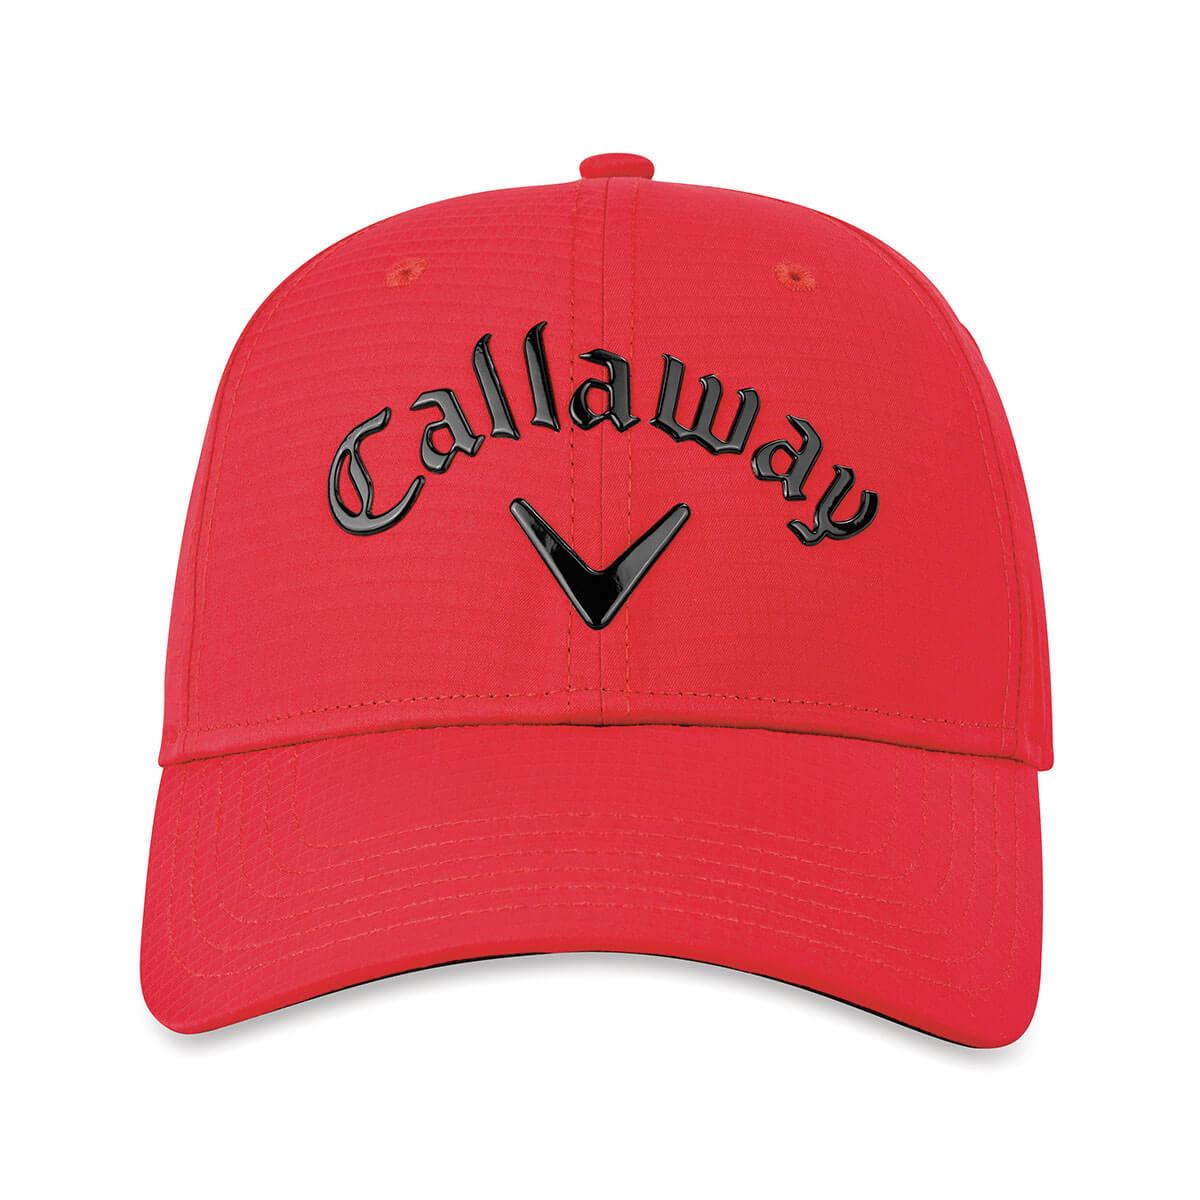 Callaway-Golf-2019-Liquid-Metal-Adjustable-Performance-Moisture-Wicking-Cap thumbnail 13